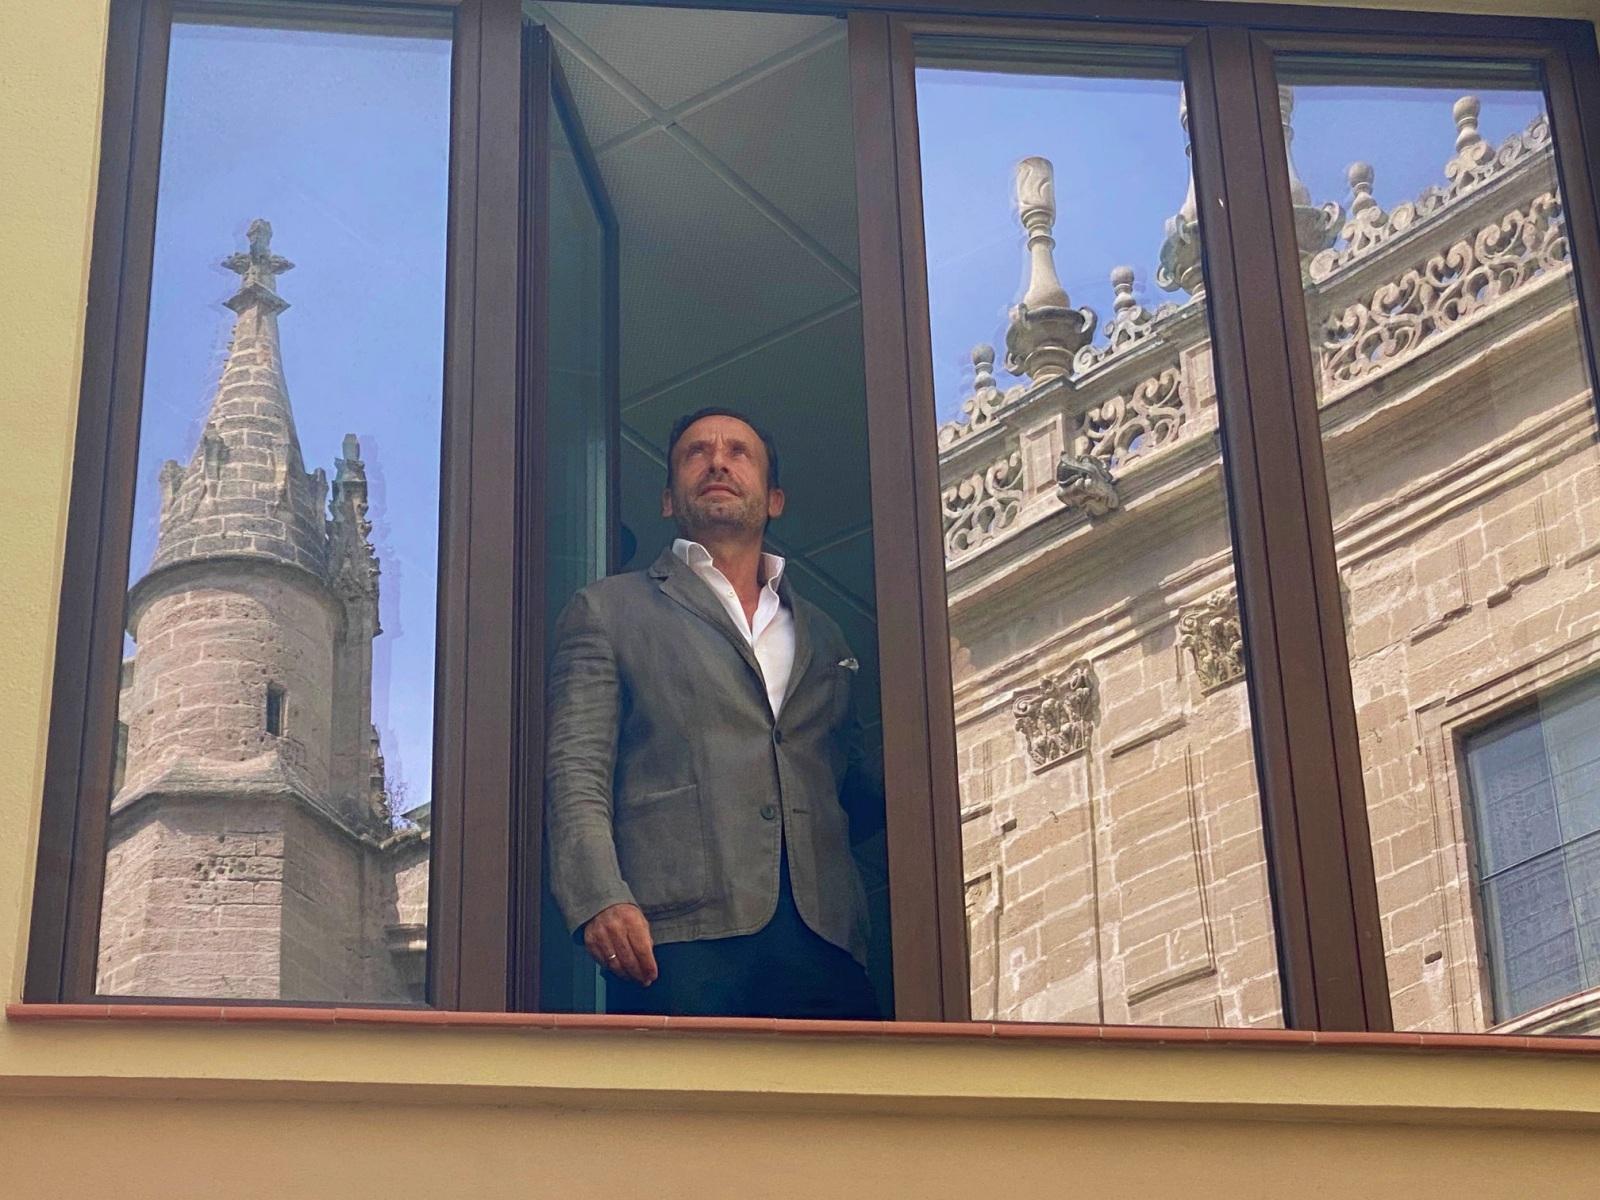 Honorio Aguilar oficina Avenida de la Constitución